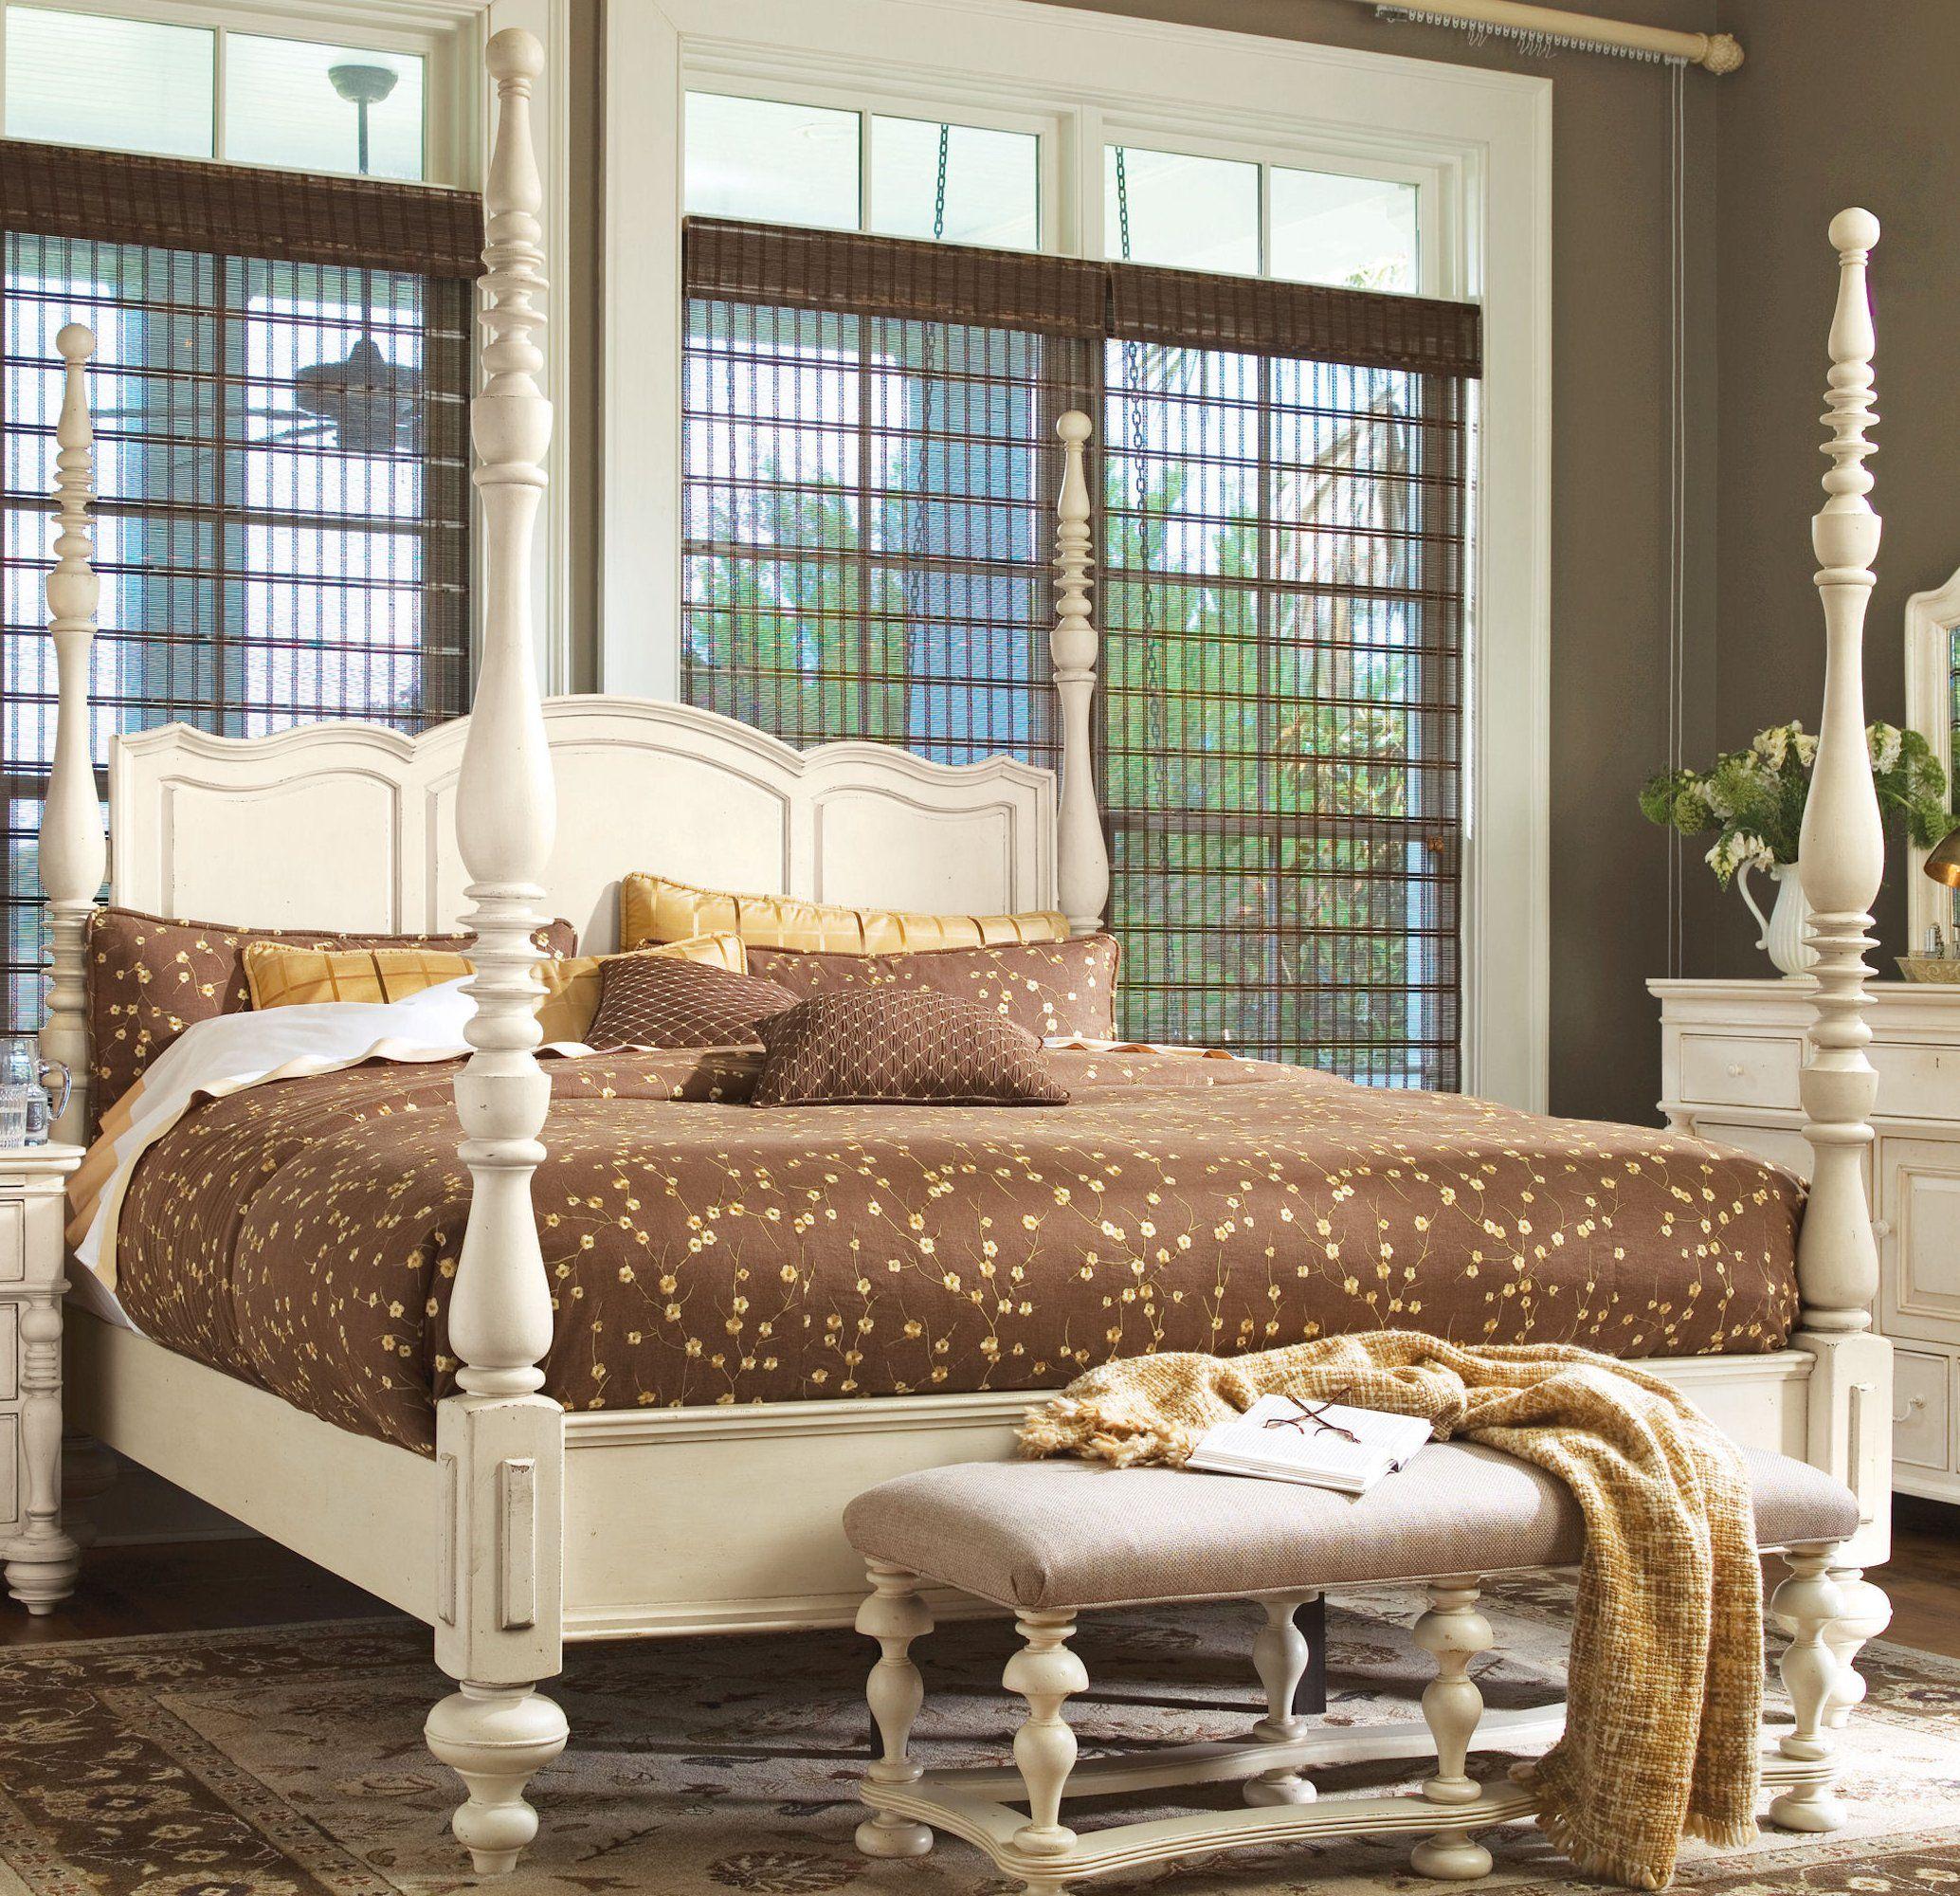 Vintage Bedroom Furniture Interesting Antique White 4 Poster Bed  Household  Pinterest  Painted Beds Inspiration